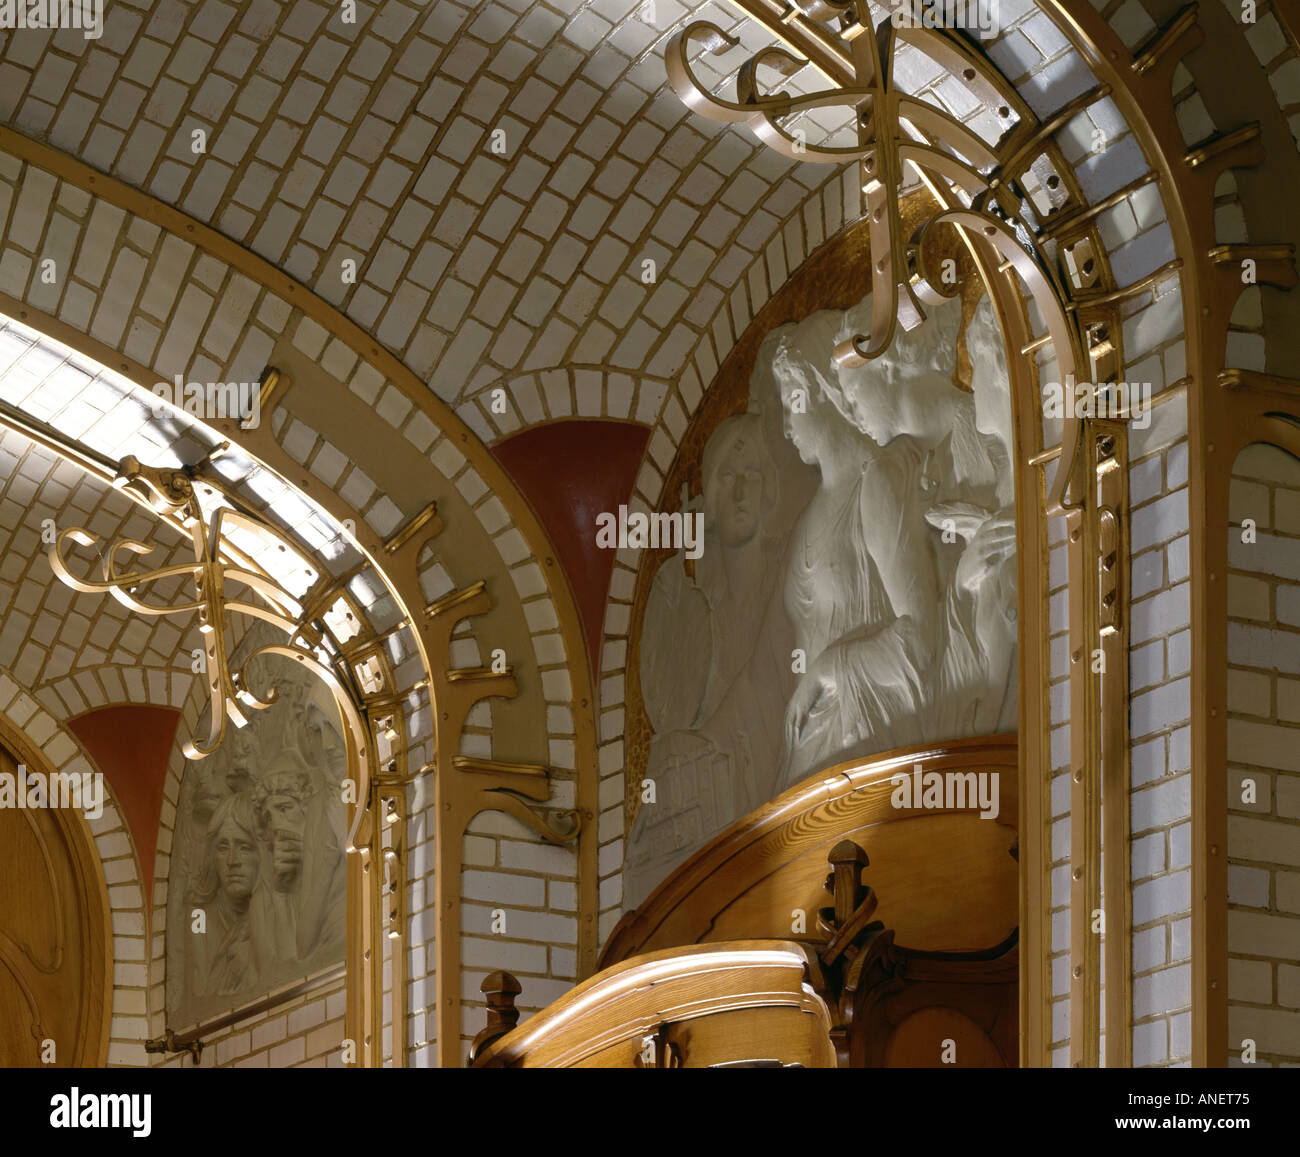 Musee Horta Bruxelles 1898 1906 Salle A Manger Avec Plafond